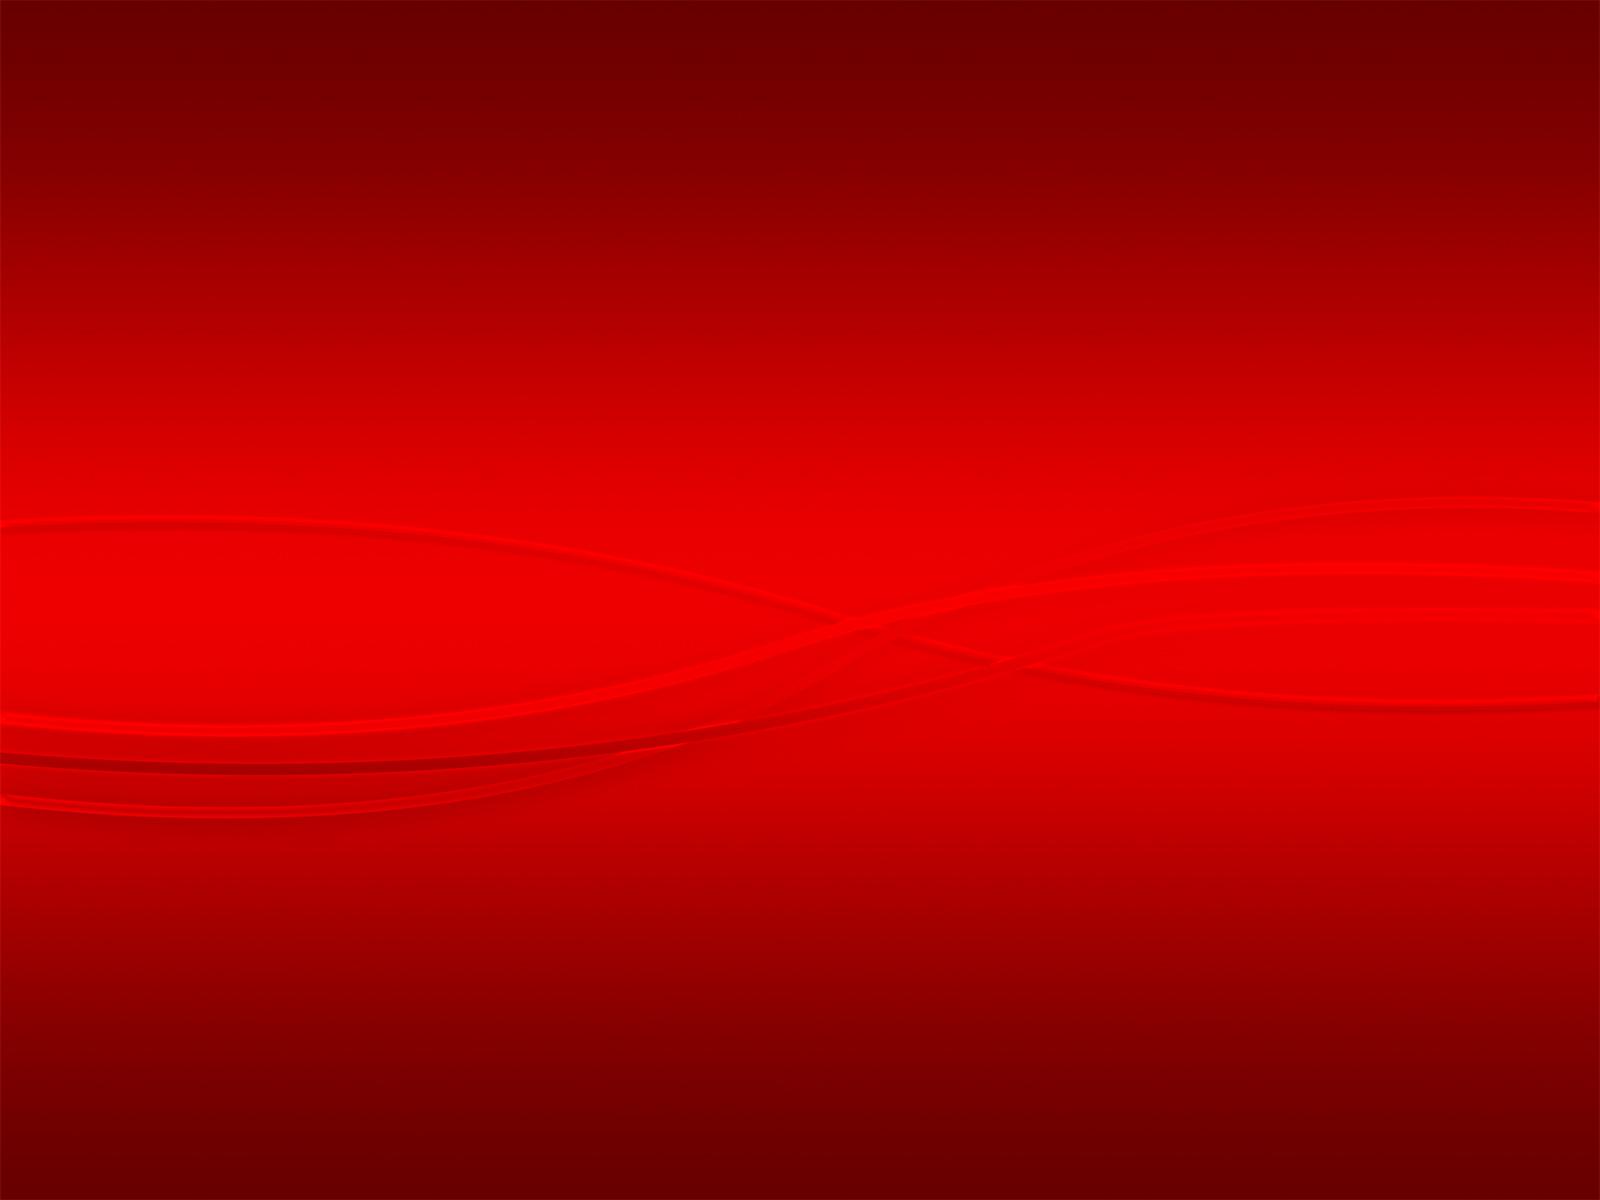 Simple Red By Arthurkremsier On Deviantart